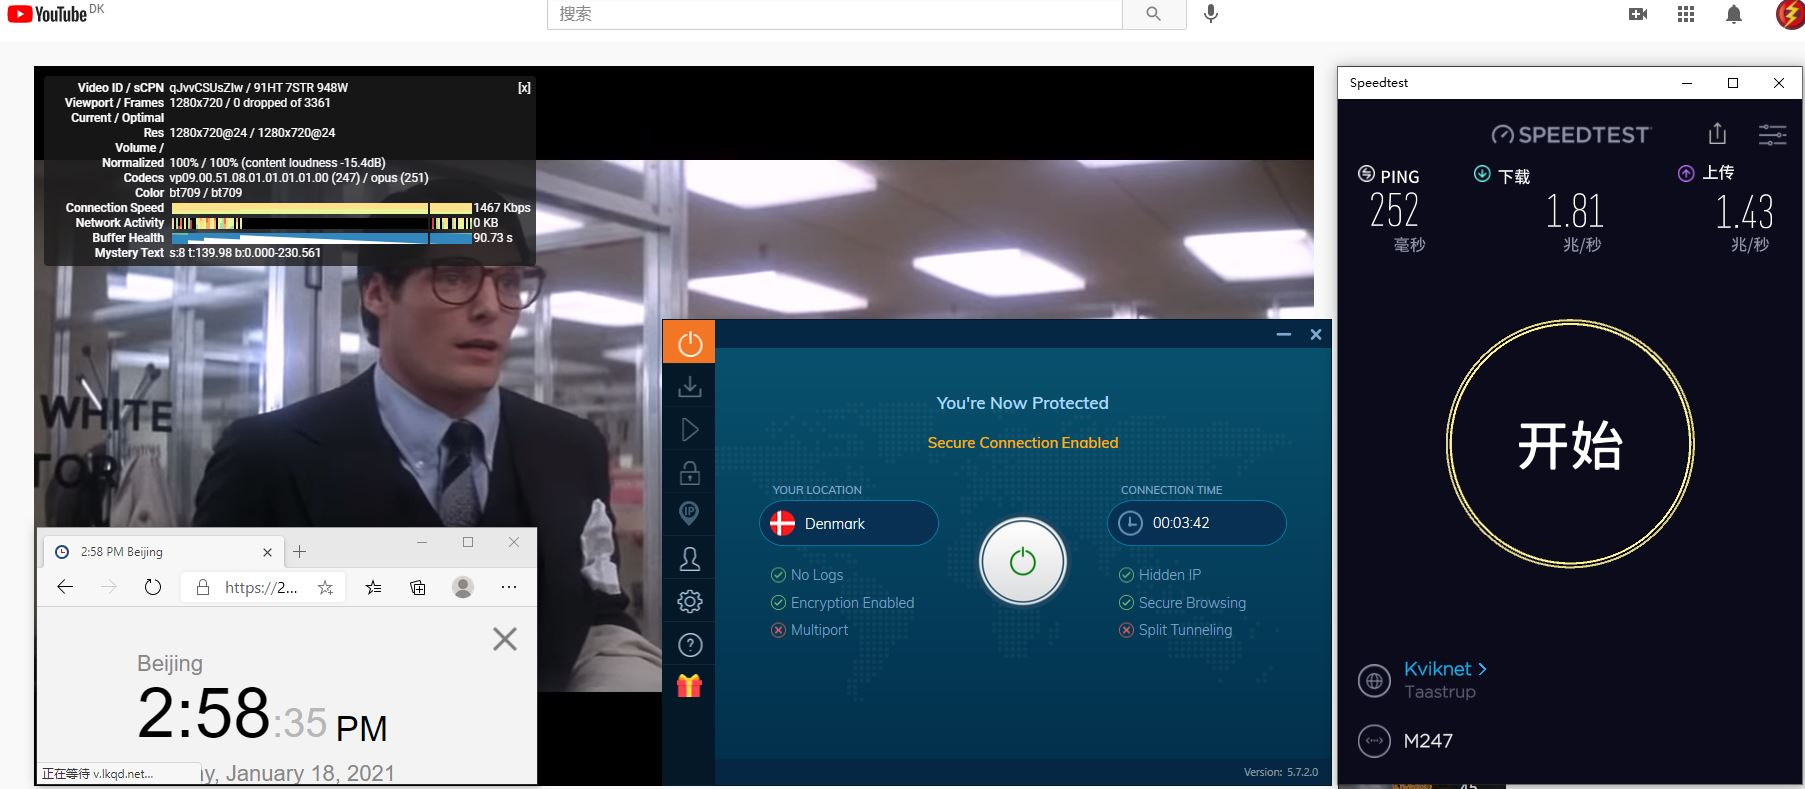 Windows10 IvacyVPN IKEv2 Denmark 服务器 中国VPN 翻墙 科学上网 10BEASTS Barry测试 - 20210118